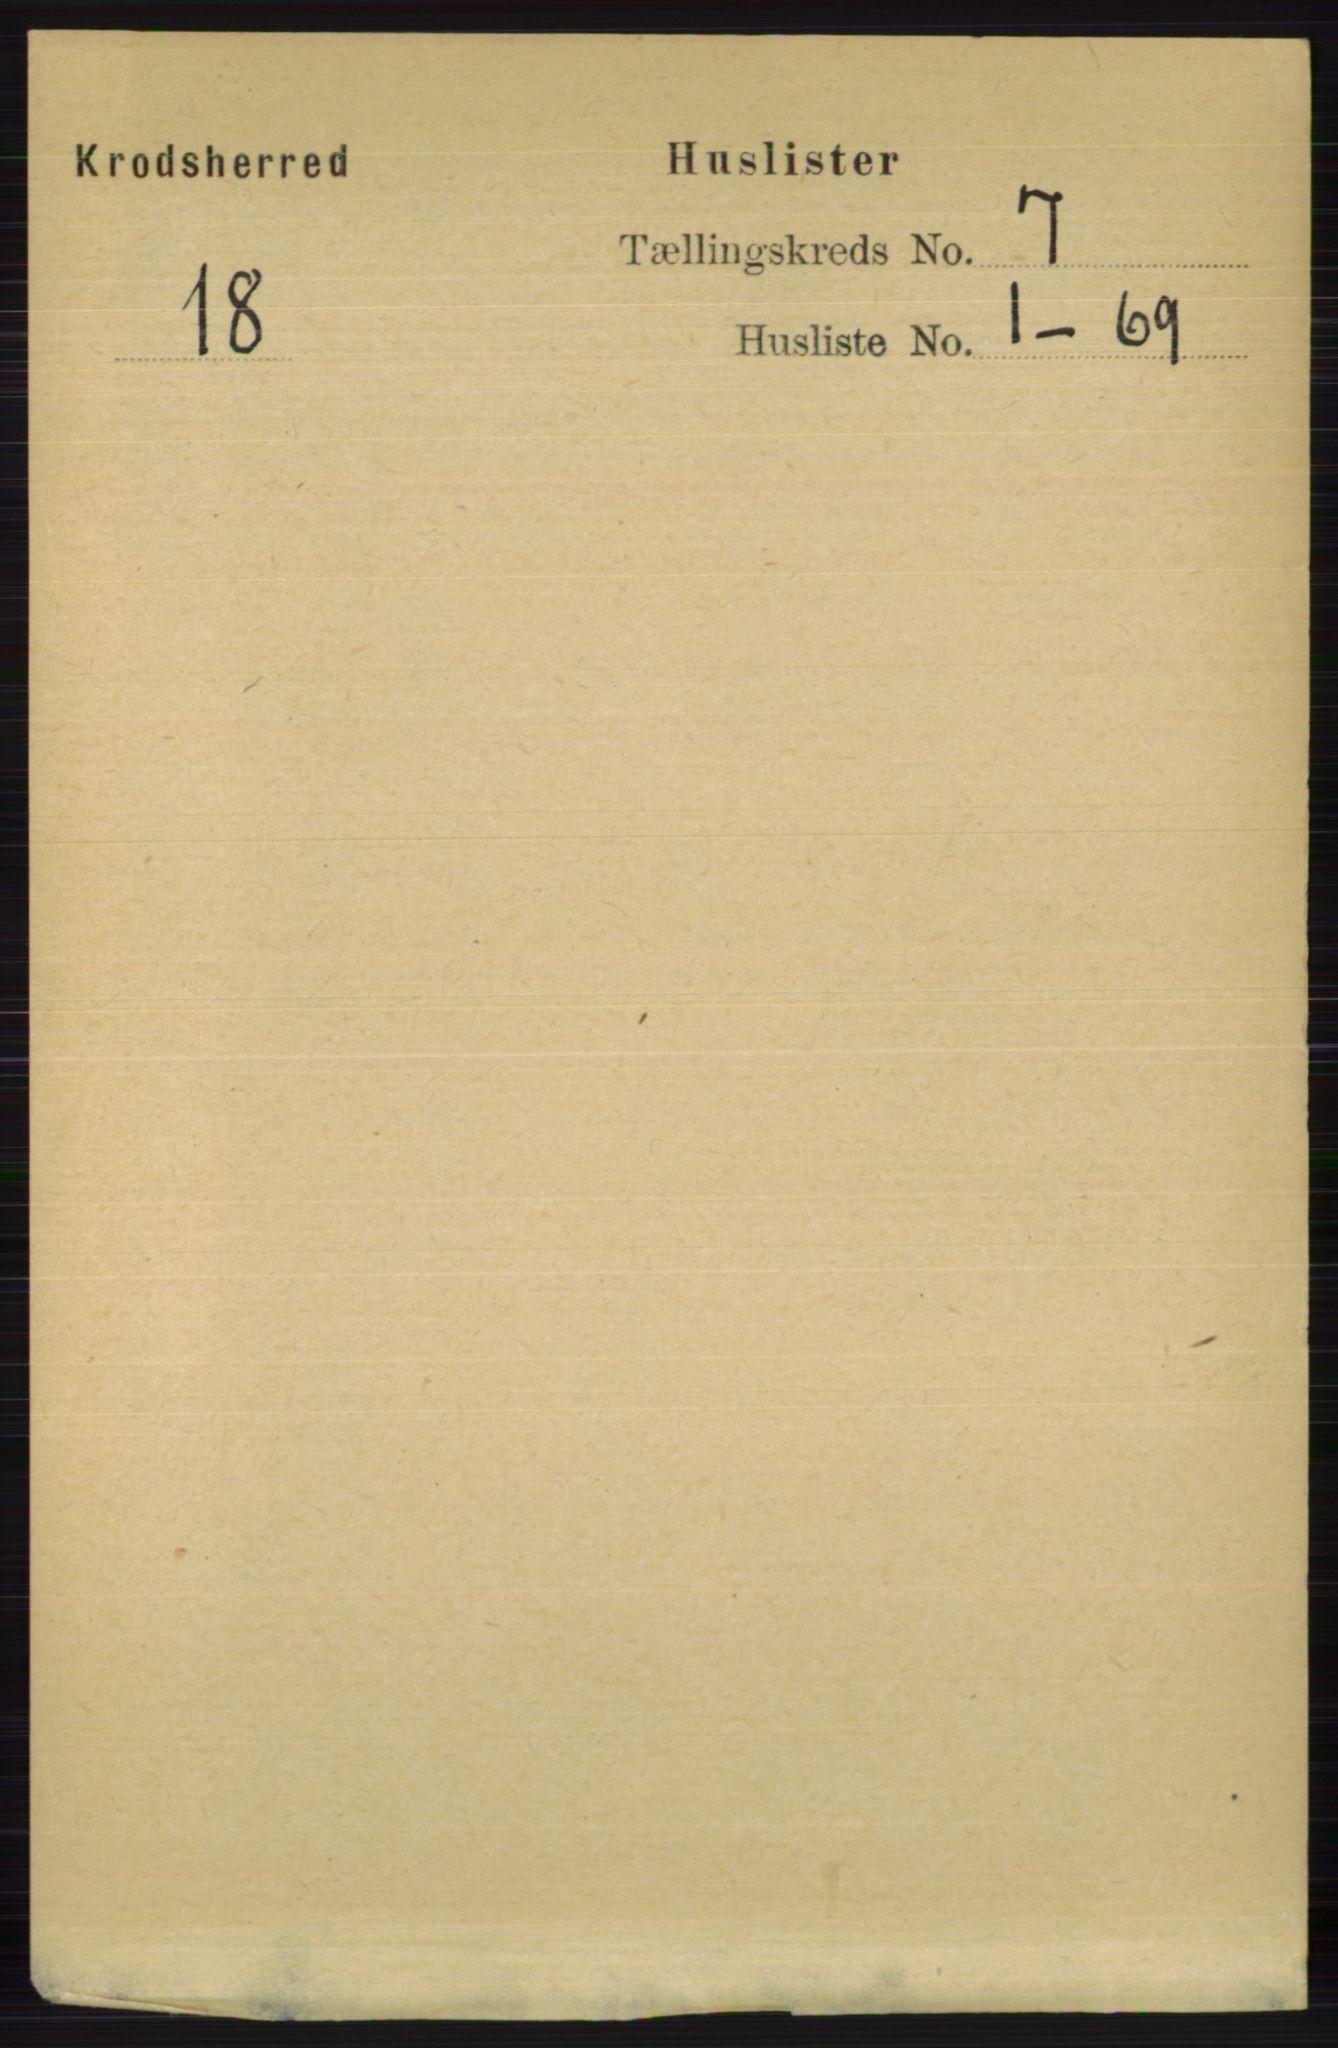 RA, Folketelling 1891 for 0621 Sigdal herred, 1891, s. 6951